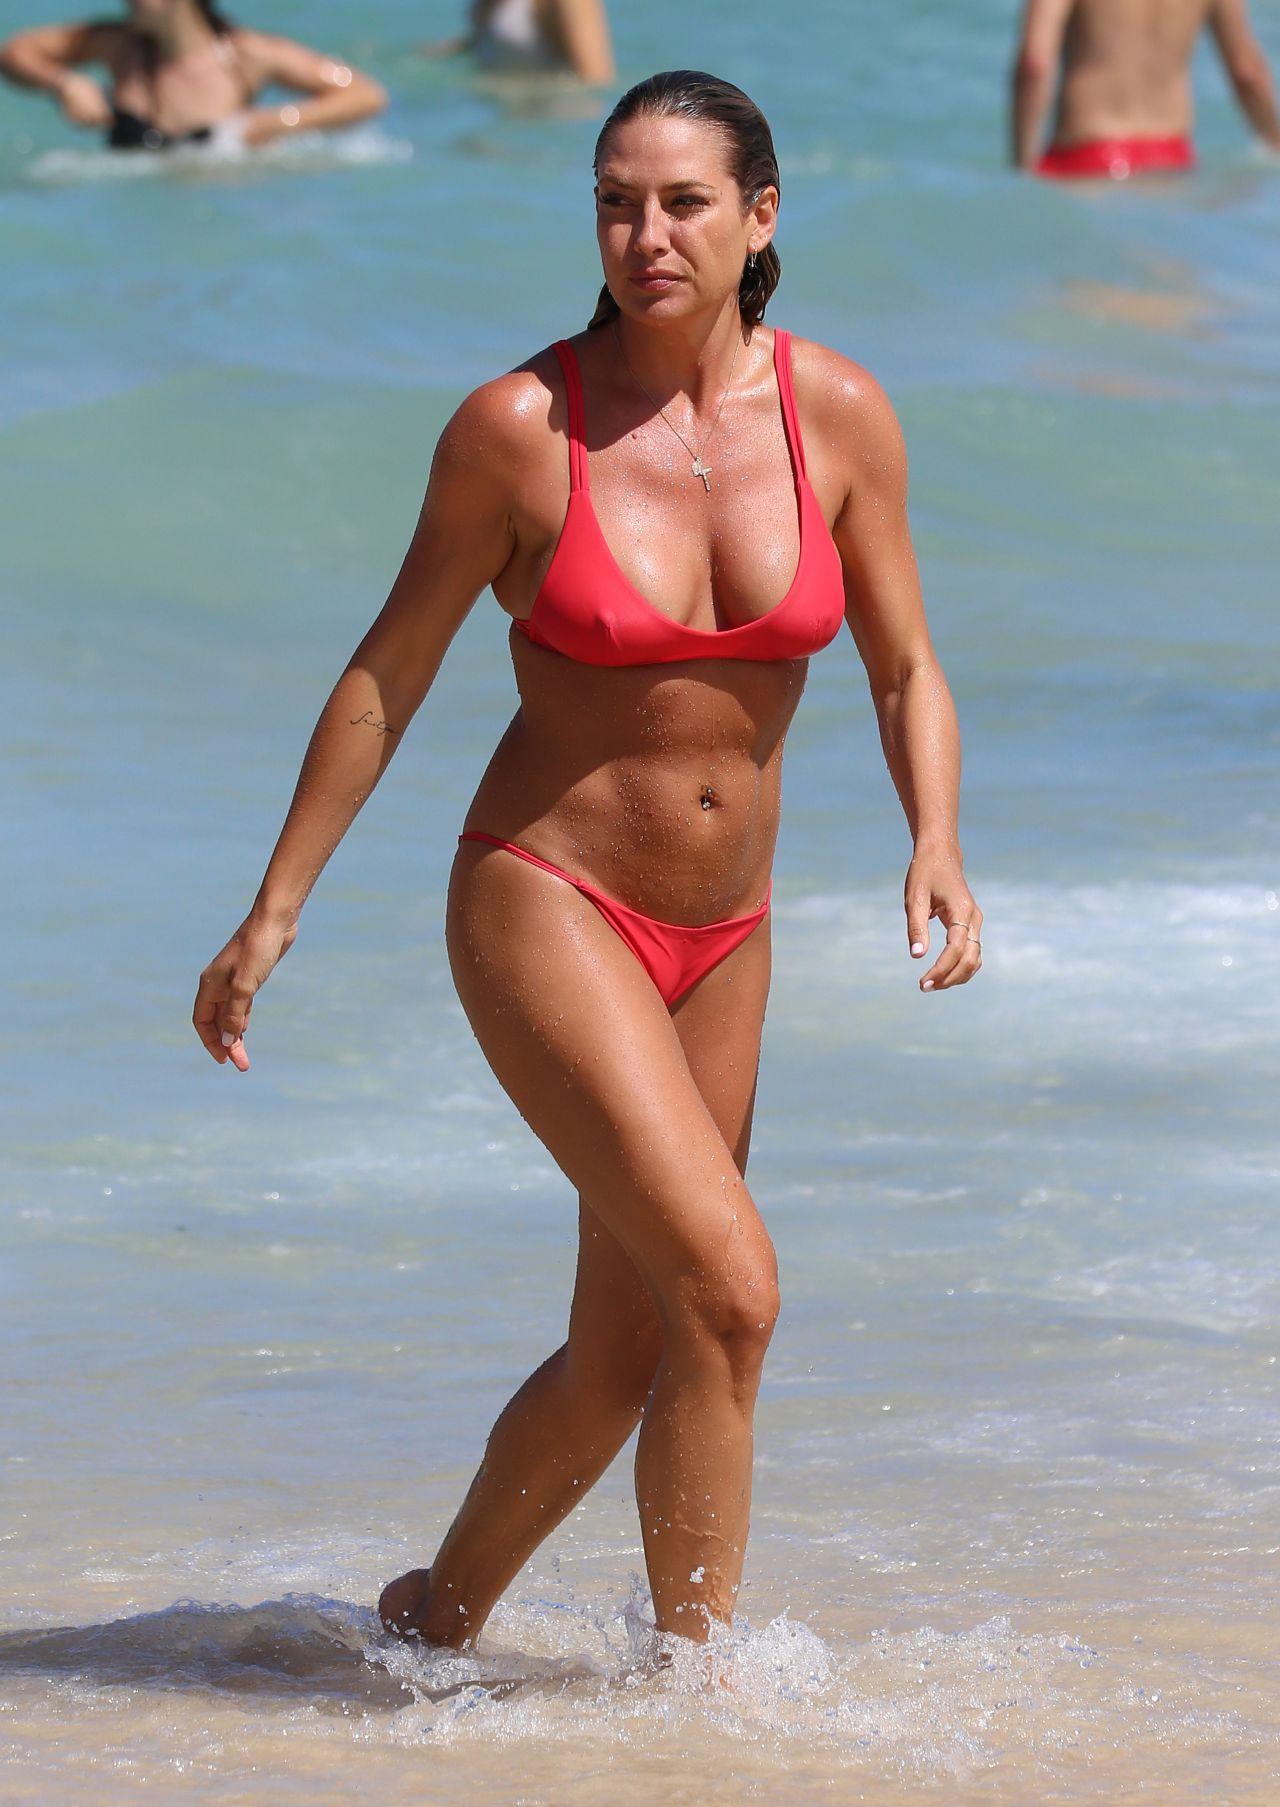 Montana Cox in Black Bikini at Tamarama beach in Sydney Pic 33 of 35